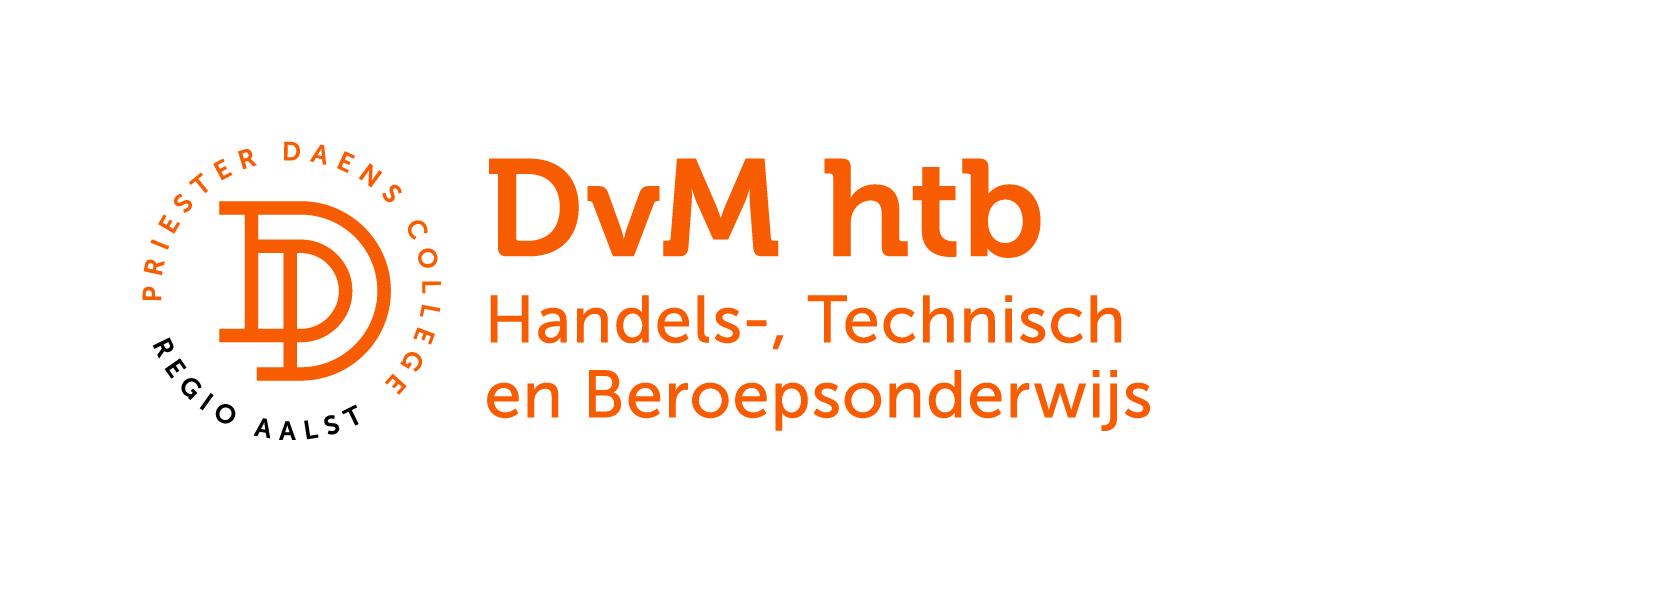 DvM htb logo